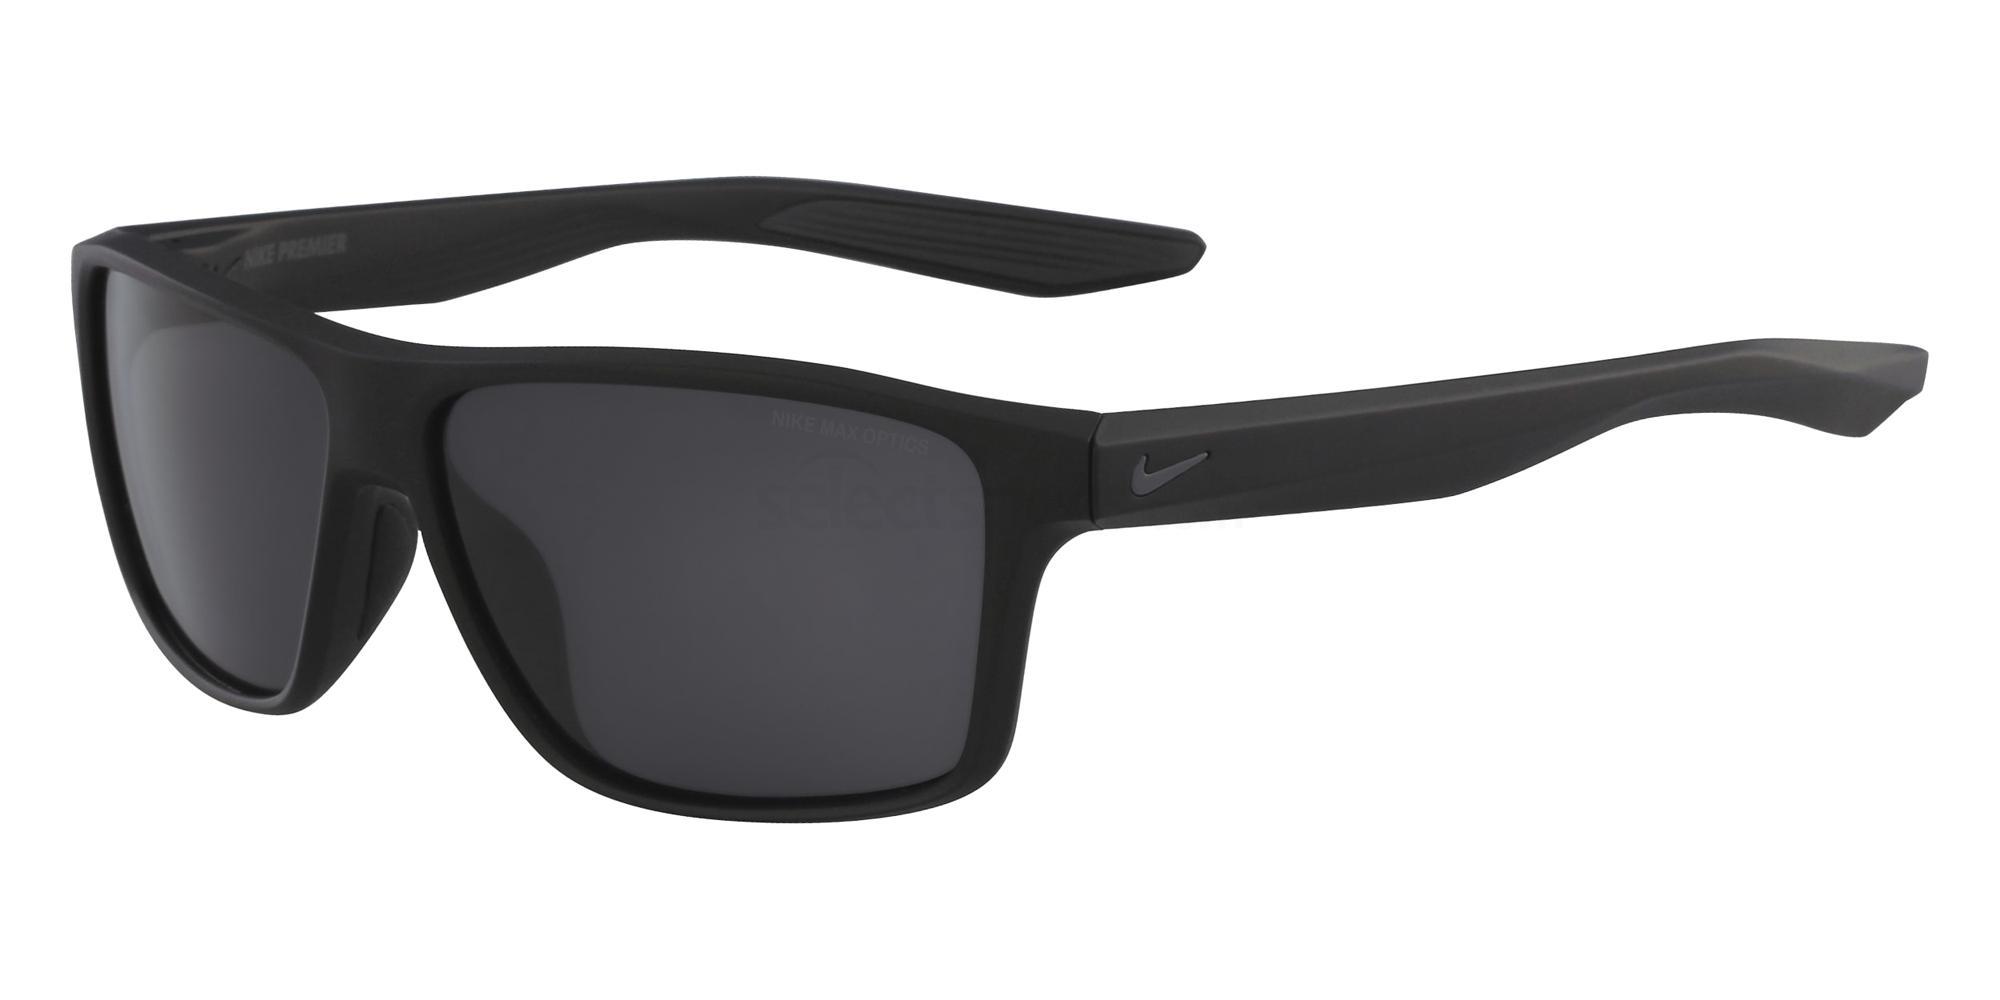 001 PREMIER EV1071 Sunglasses, Nike